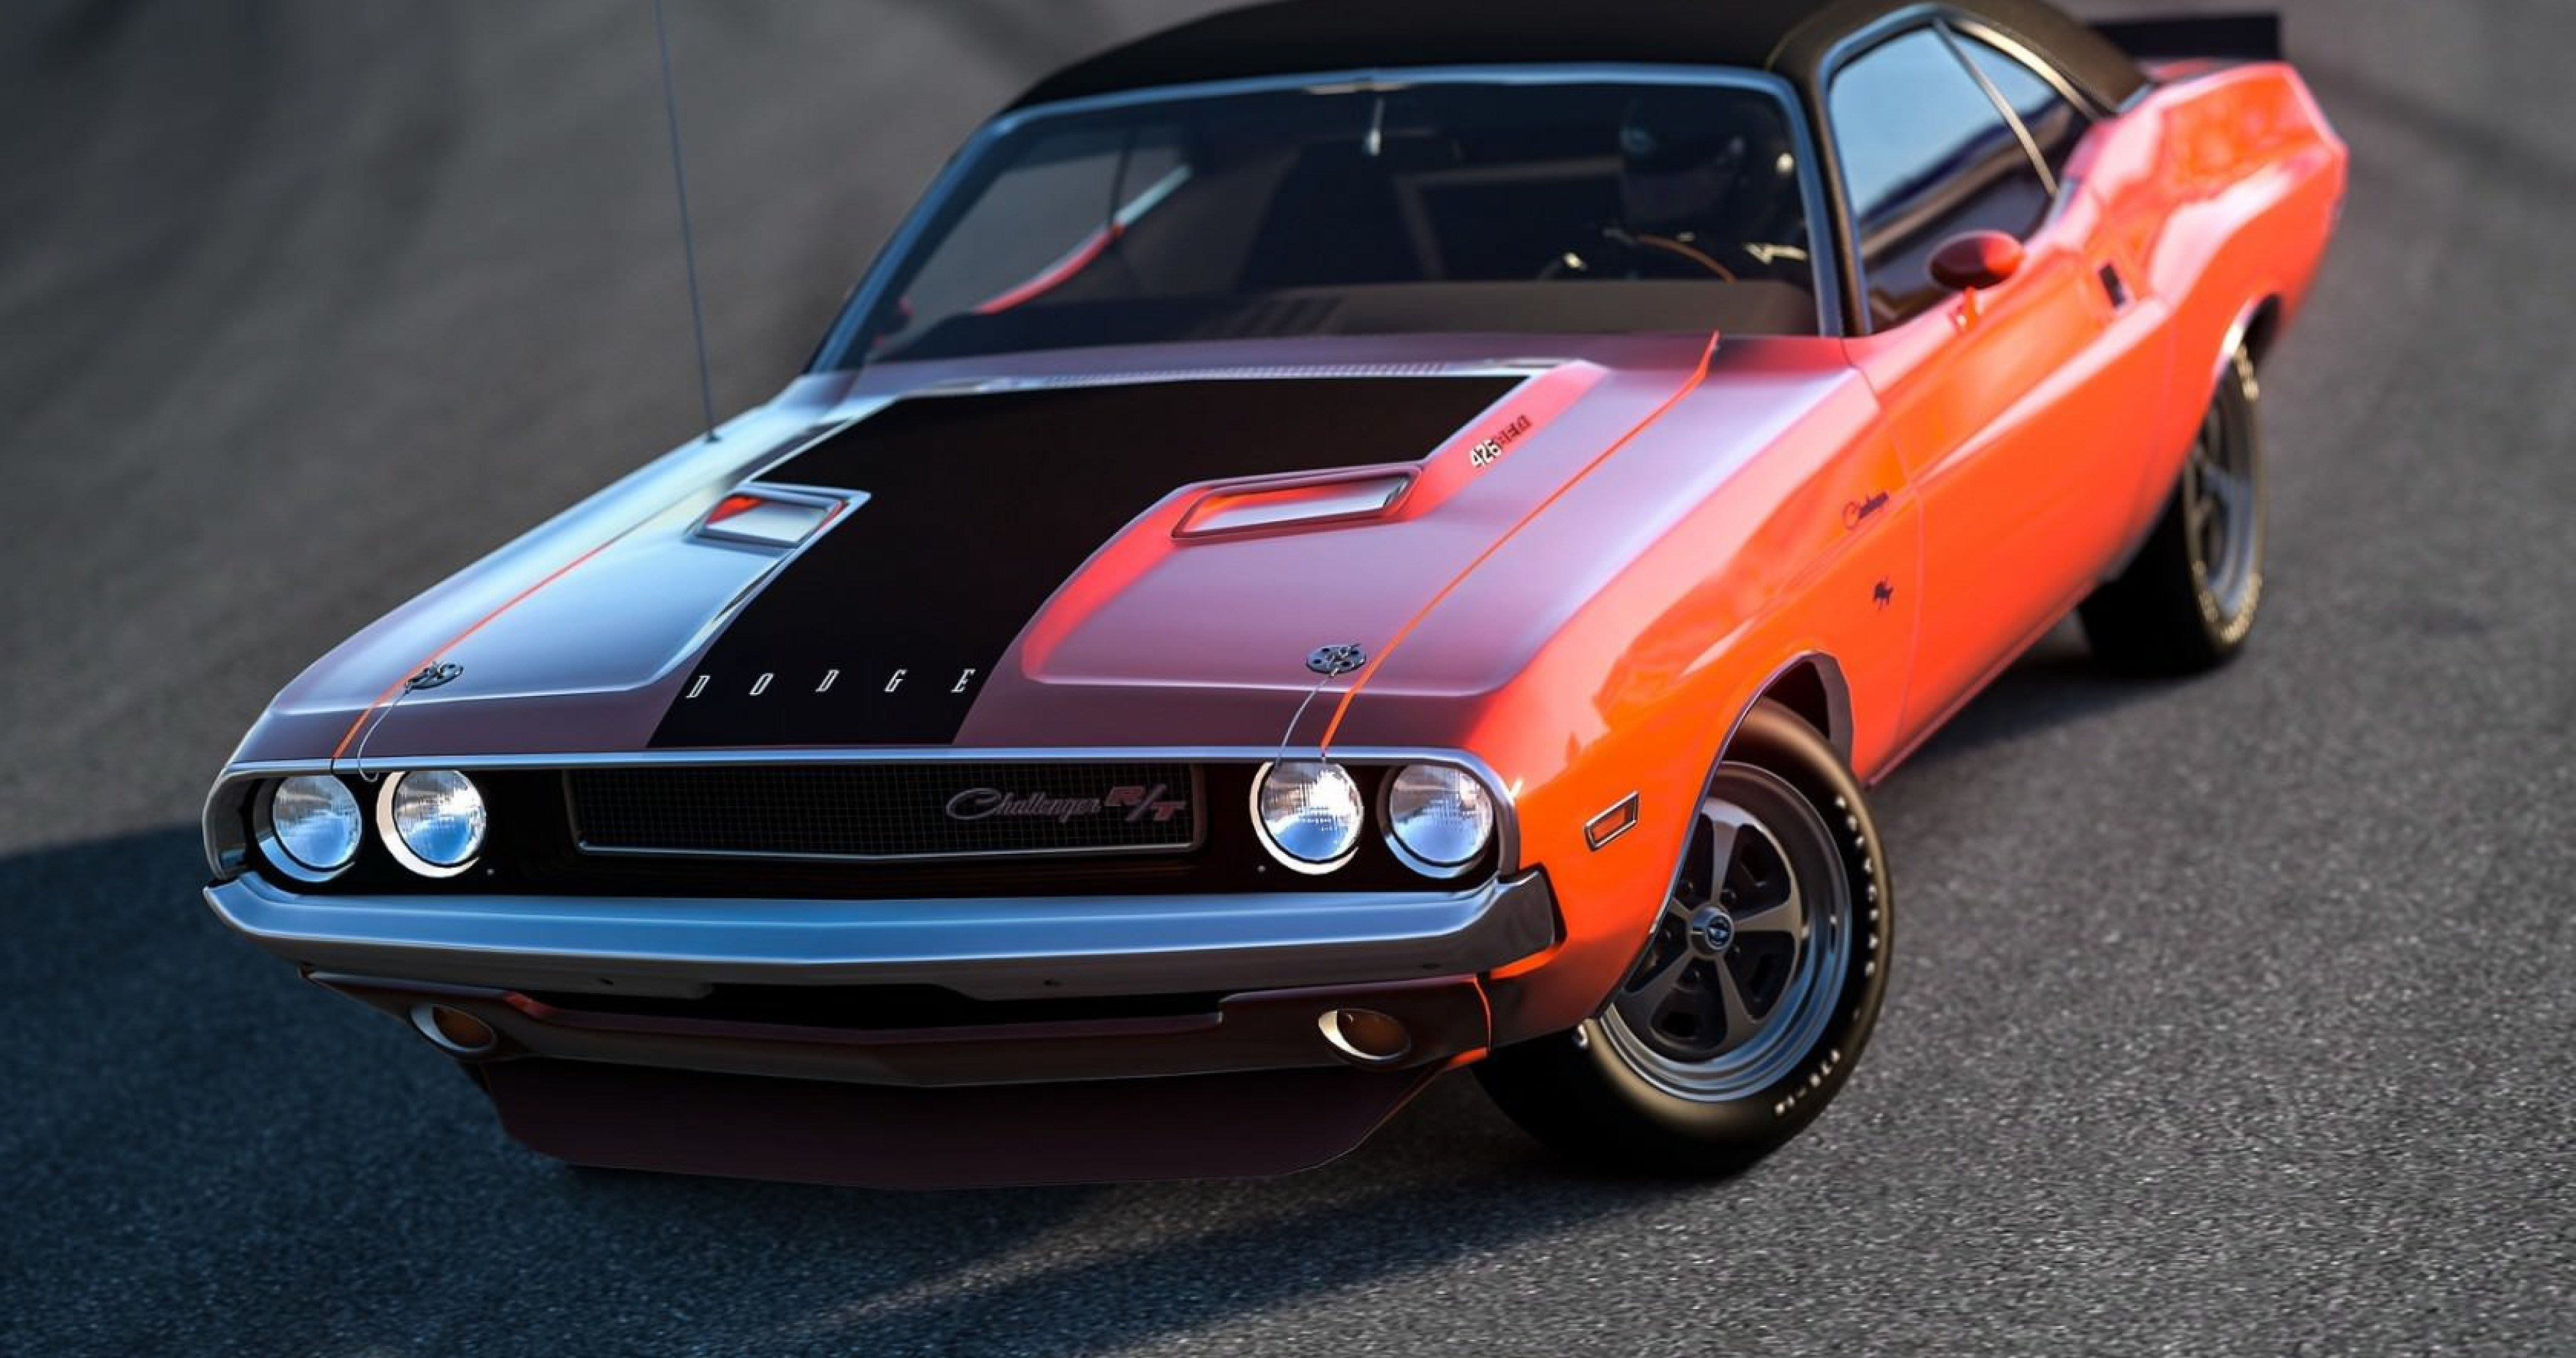 Attractive Dodge Challenger Muscle Car 4k Ultra Hd Wallpaper